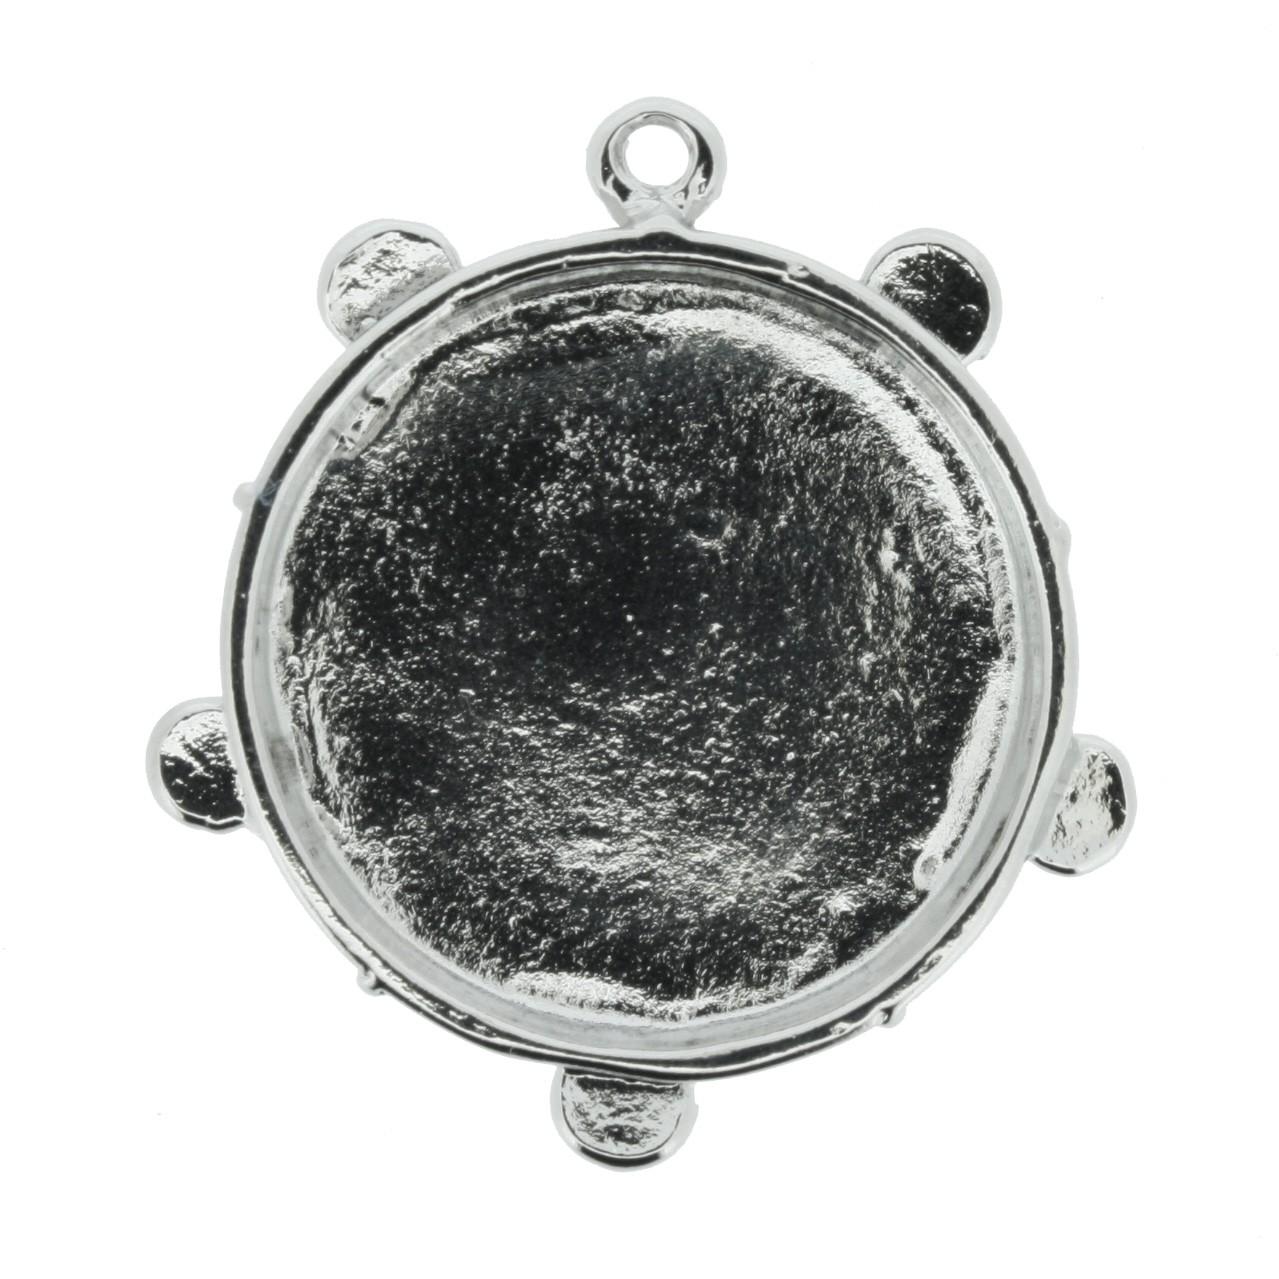 Pandeiro - Níquel - 35mm  - Stéphanie Bijoux® - Peças para Bijuterias e Artesanato